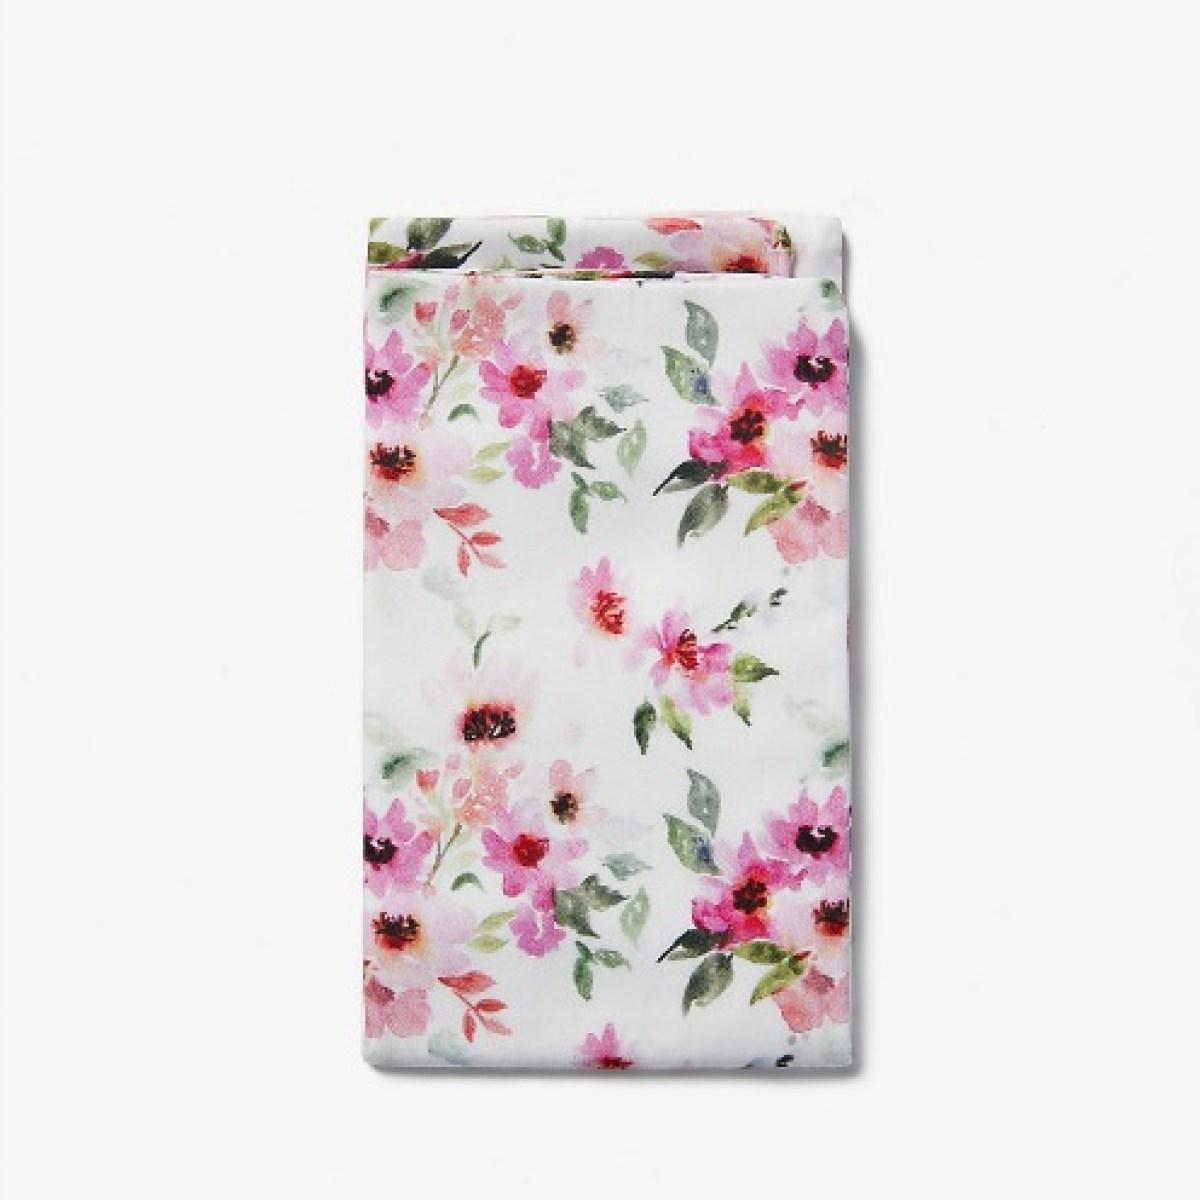 Floral Pre-folded pocket square